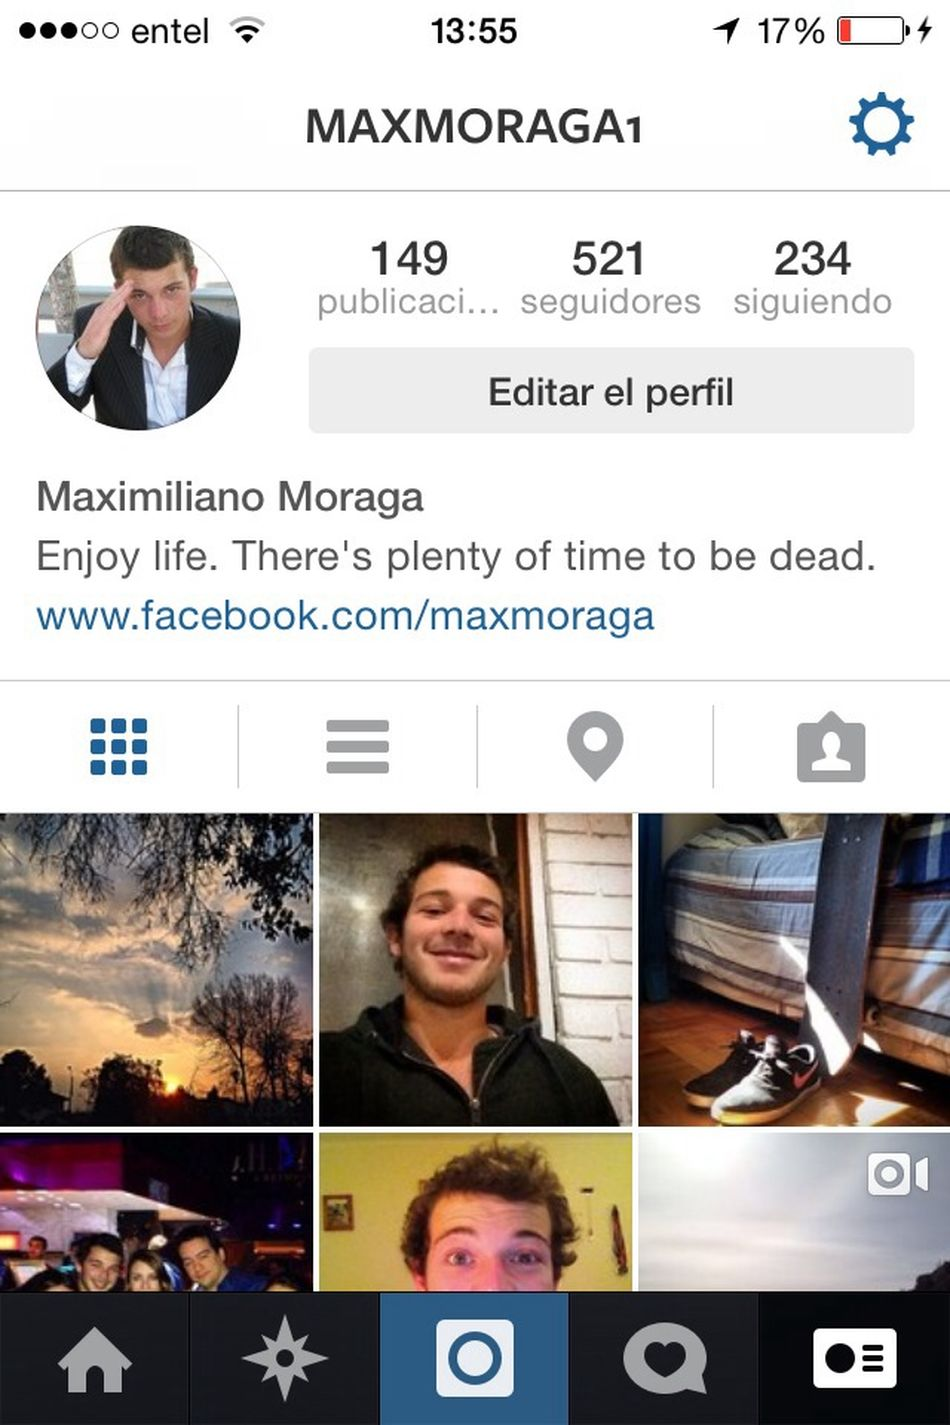 Follow me :) @maxmoraga1 Instagram Follow Me That's Me Check This Out